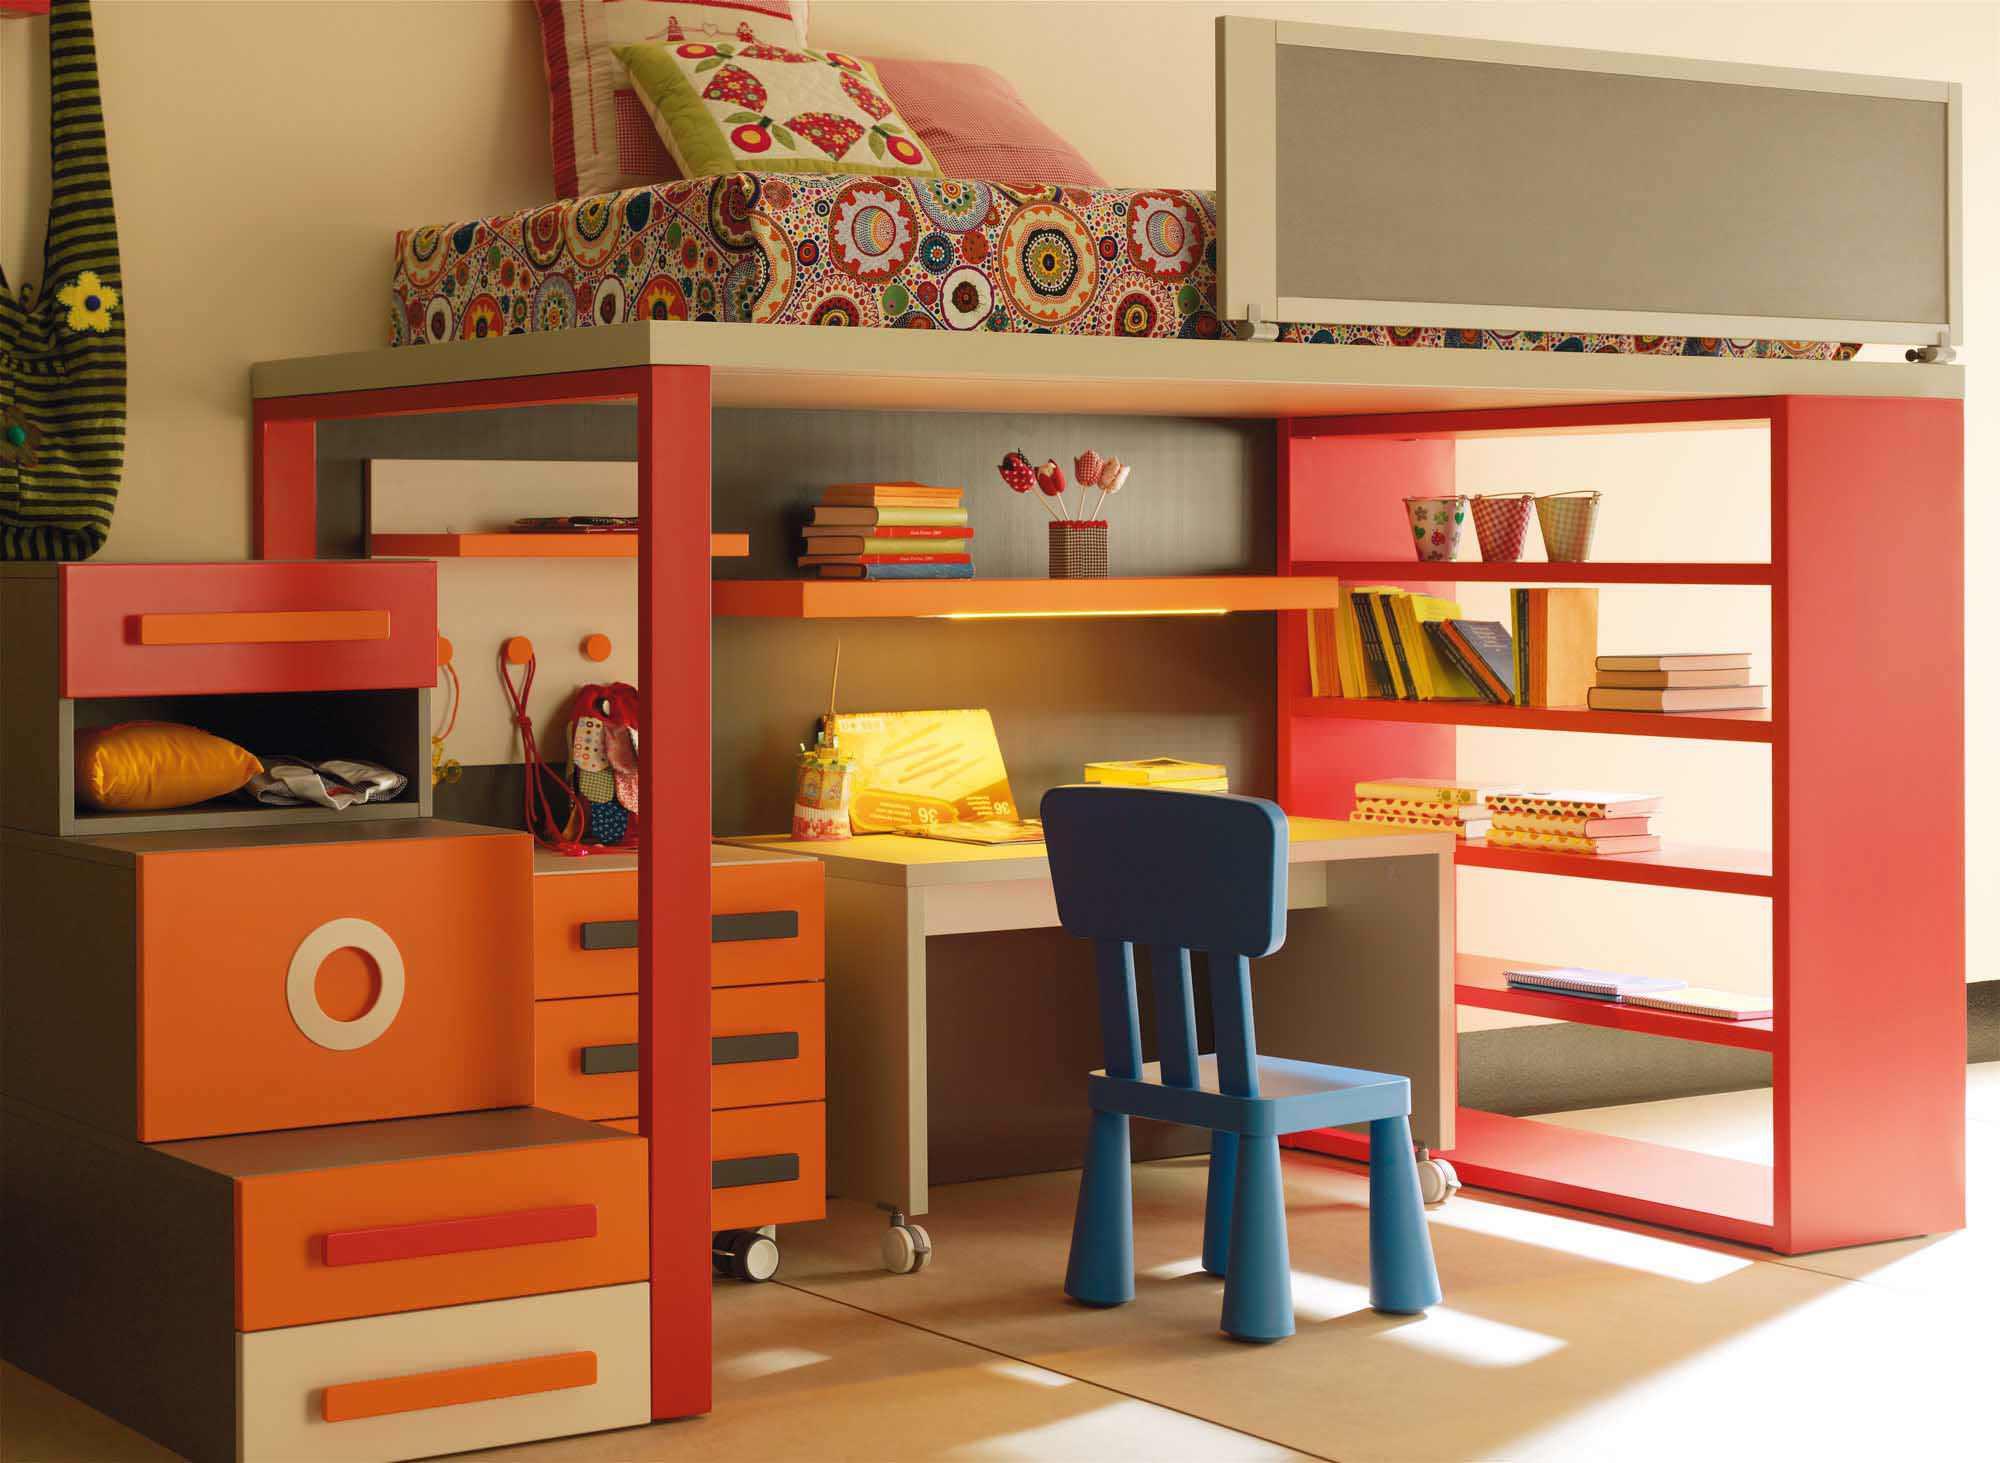 Toddler boys' room furniture Children's room storage furniture Children's room furniture JWGSFKW